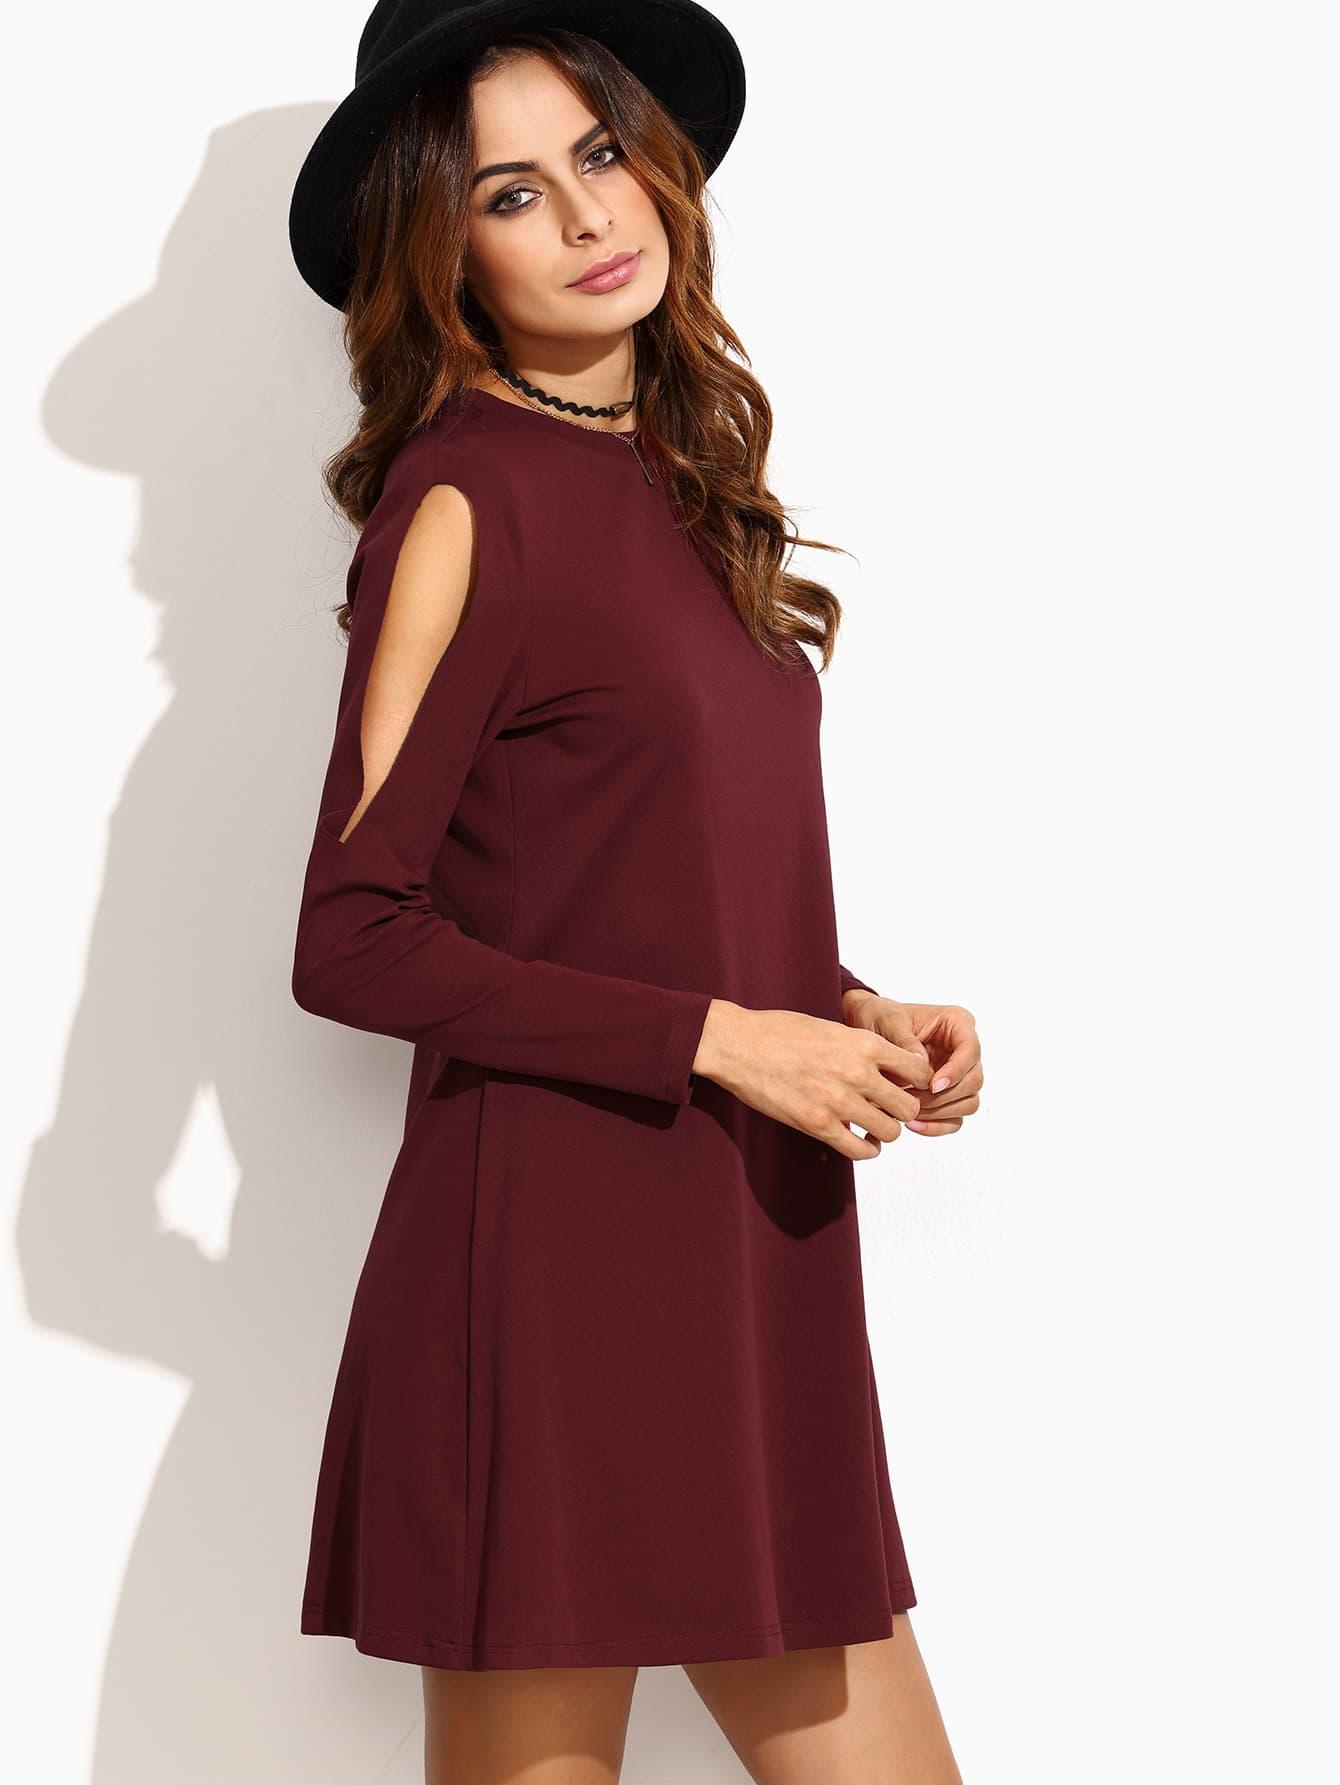 Kleid Cut-Outs am Schulter - burgund rot